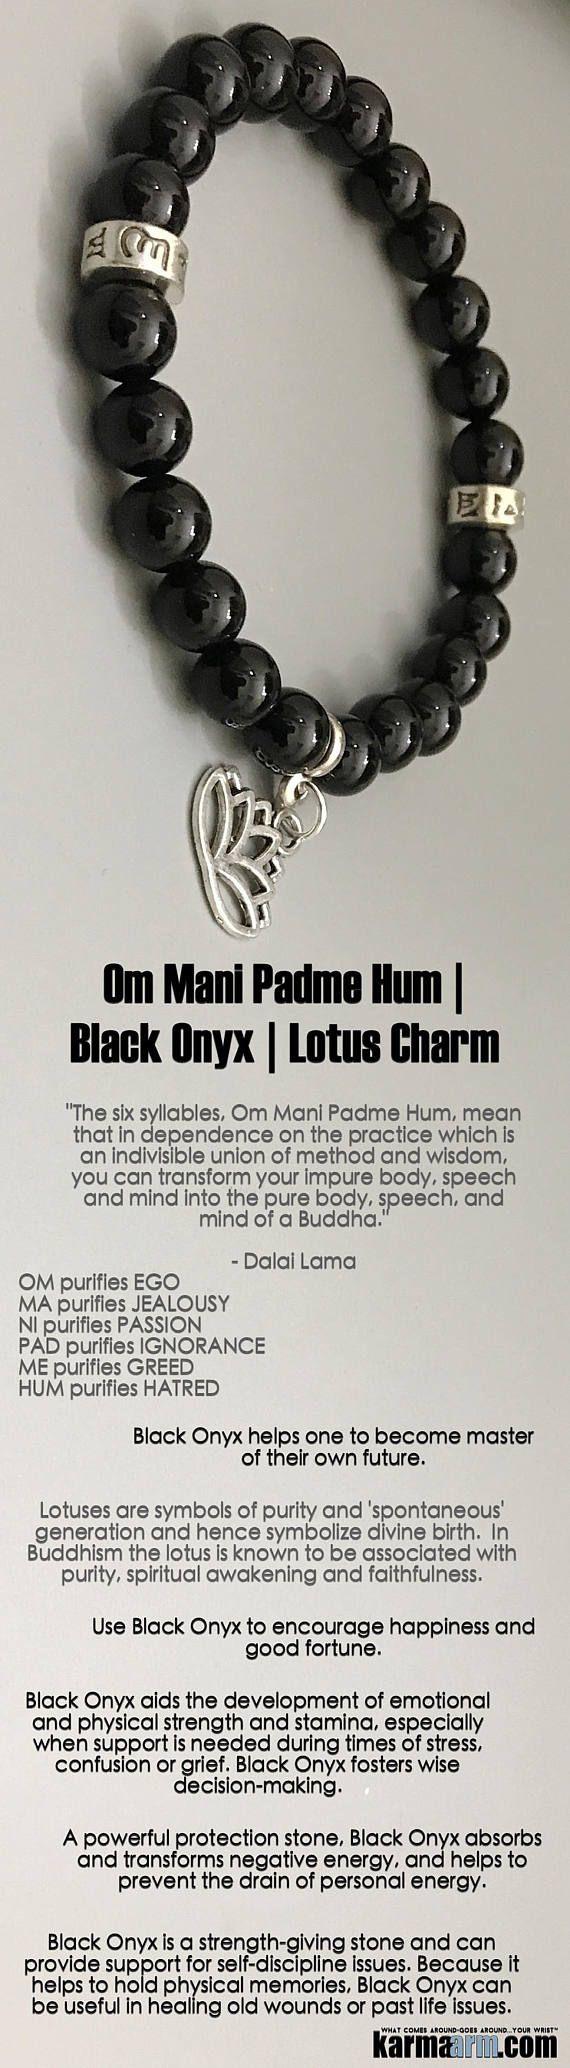 Use #Black #Onyx to encourage #happiness and good #fortune. A #strength-giving #stone, it helps one to become master of their own future.  #OM #Om #Mani #Padme #Hum #Buddhist #Lotus #fertility  #Beaded #Beads #Bijoux #Bracelet #Bracelets #Buddhist #Chakra #Charm #Crystals #Energy #gifts #gratitude #Handmade #Healing #Jewelry #Kundalini #LawOfAttraction #LOA #Love #Mala #Meditation #Mens #prayer #pulseiras #Reiki #Spiritual #Stacks #Stretch #Womens #Yoga #YogaBracelets